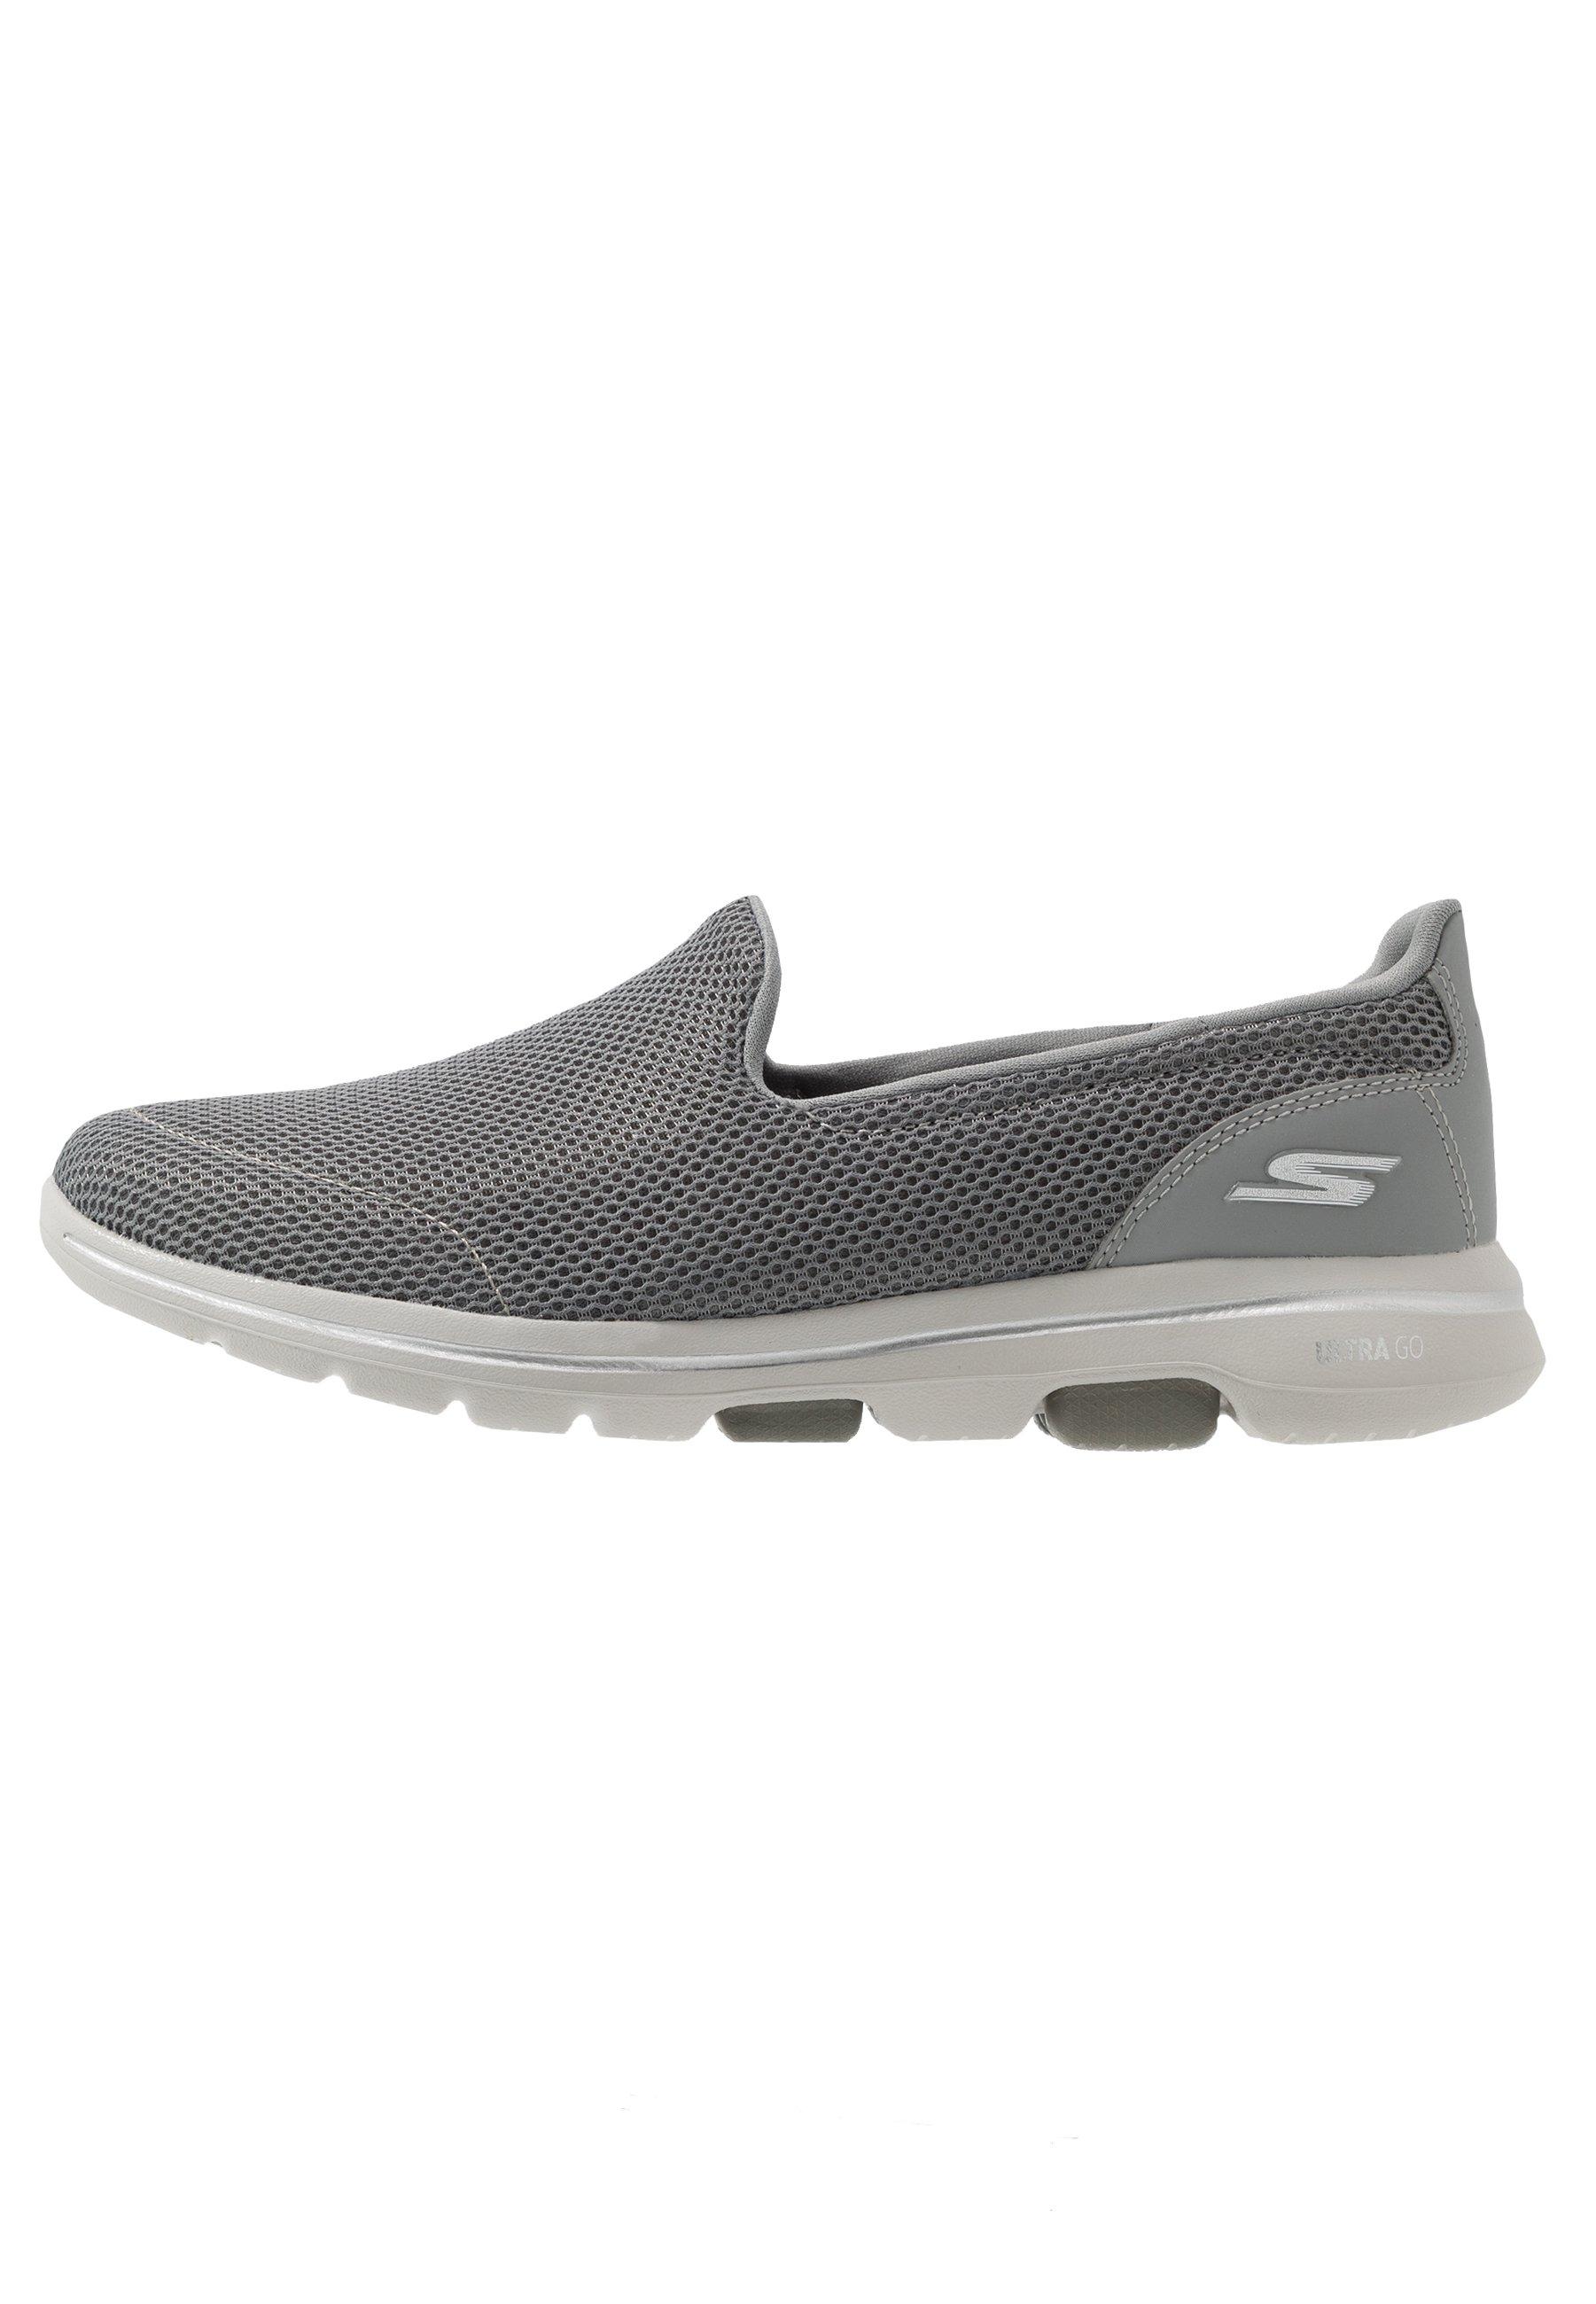 GO WALK 5 Walkingschuh gray